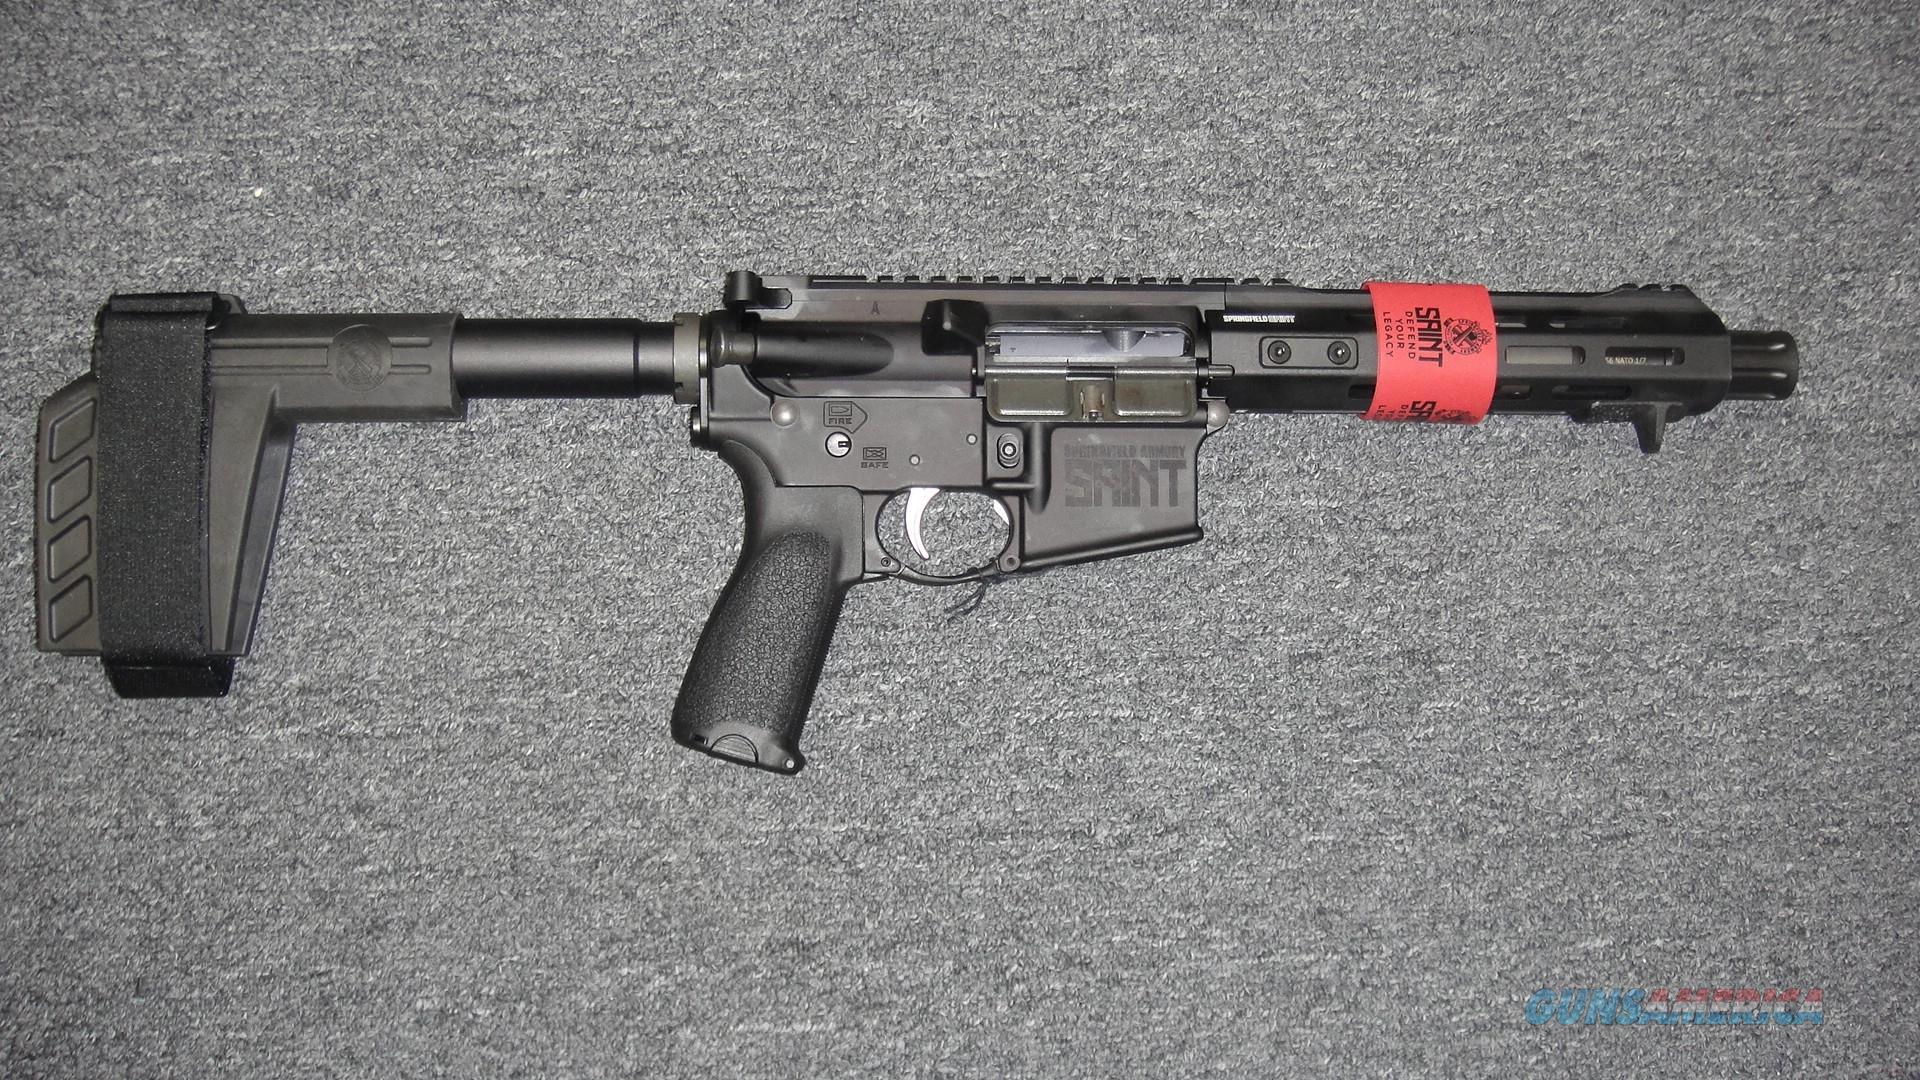 Springfield Armory SAINT W/ Arm Brace  Guns > Rifles > Springfield Armory Rifles > SAINT